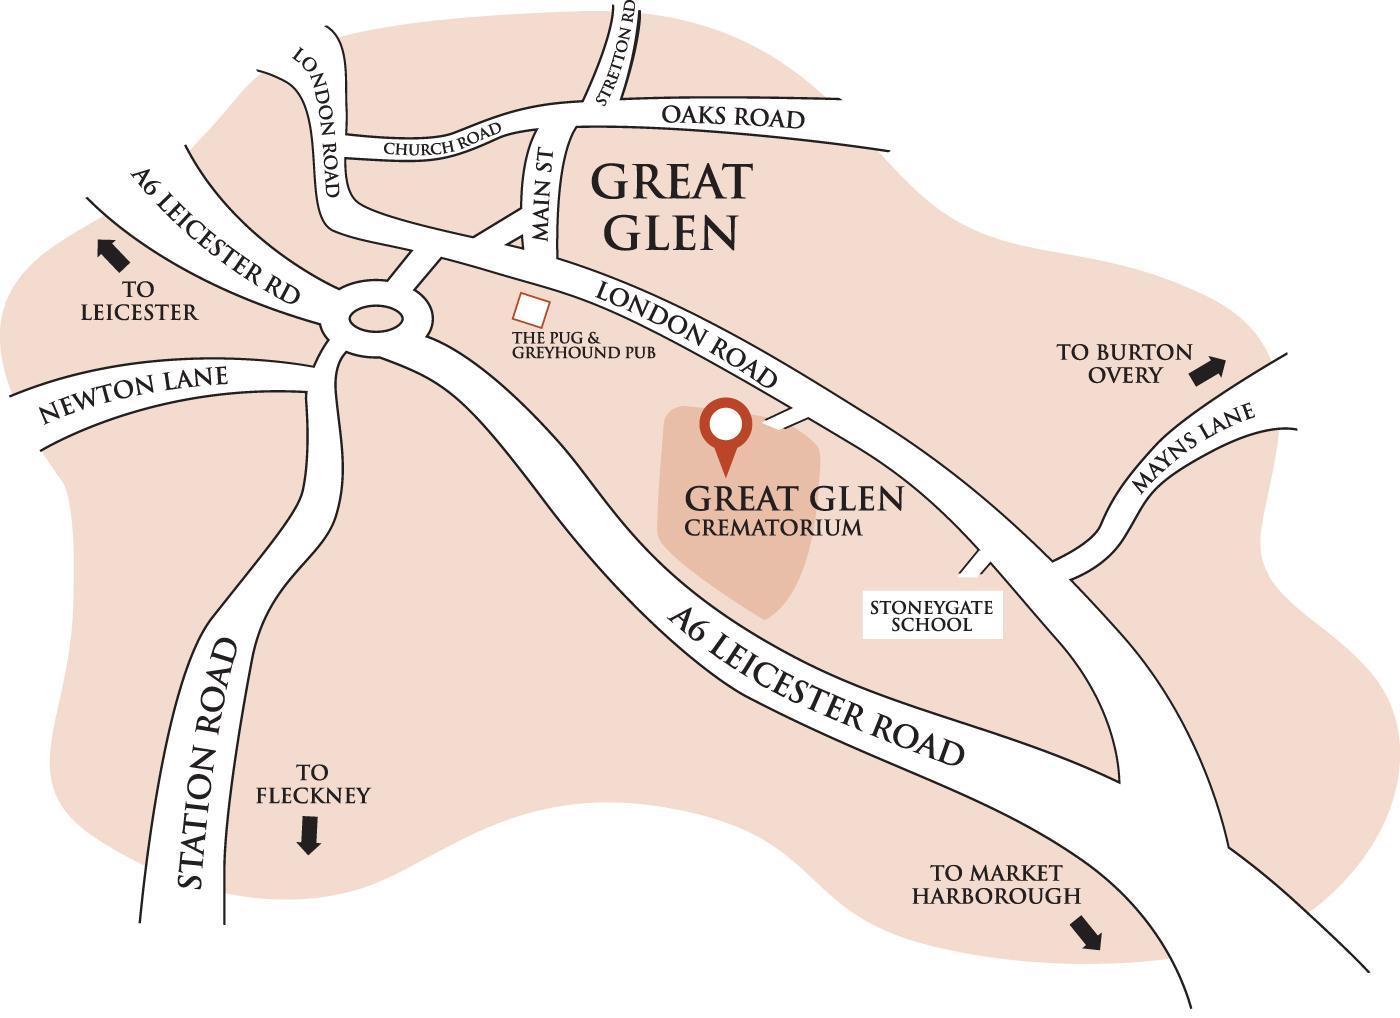 Find Home Plans Crematoria Great Glen Crematorium J Stamp And Sons